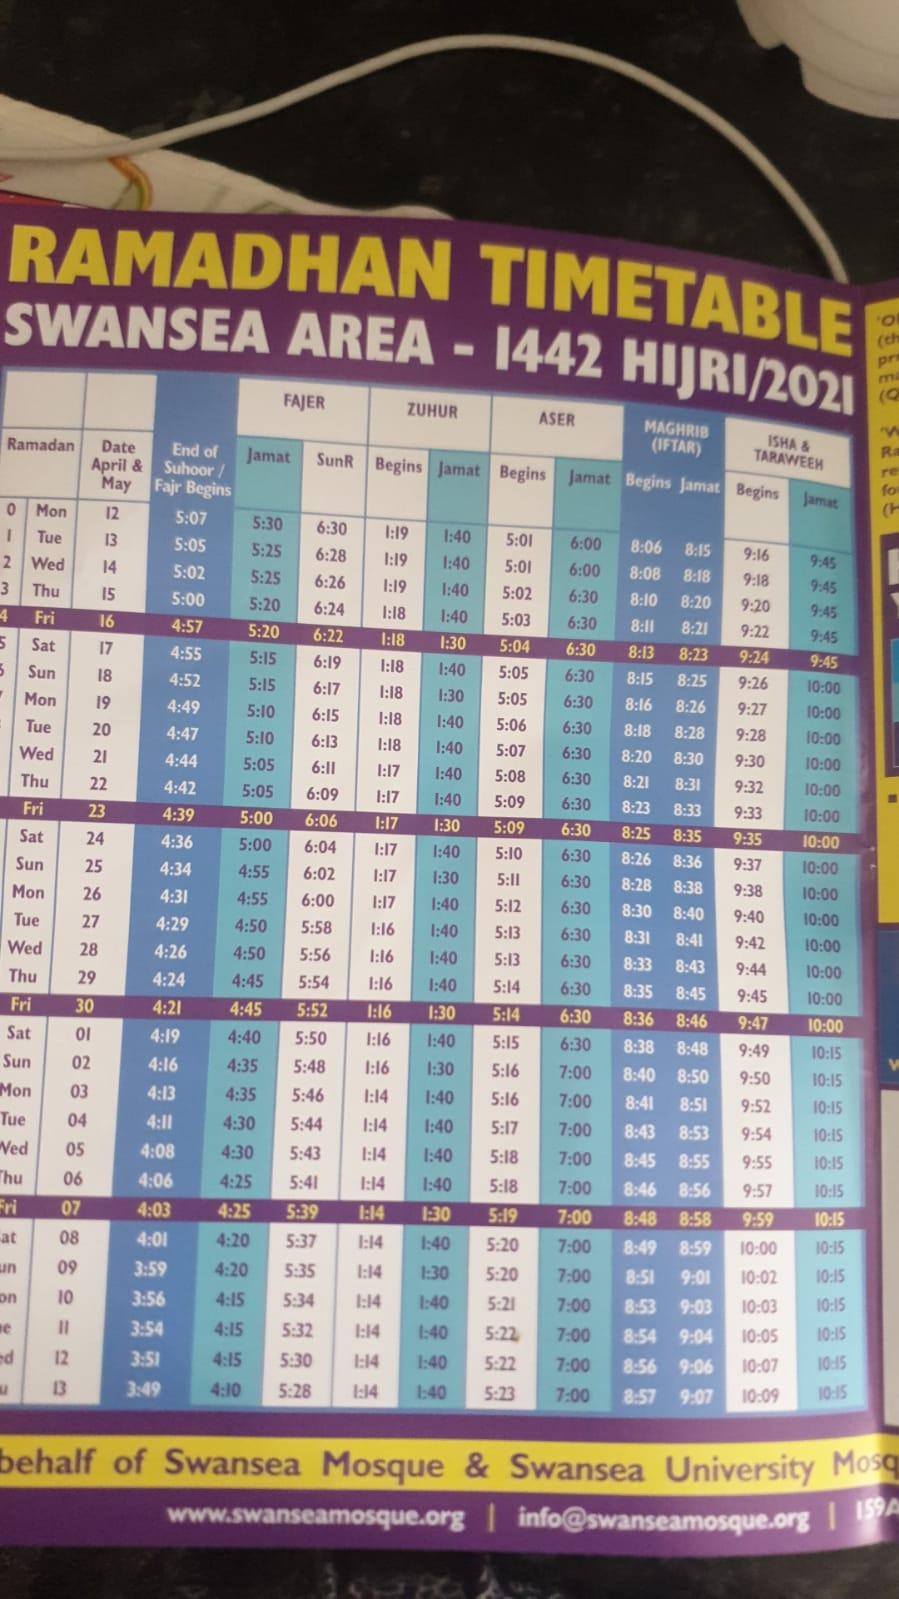 Ramadan prayer and breaking fast schedule